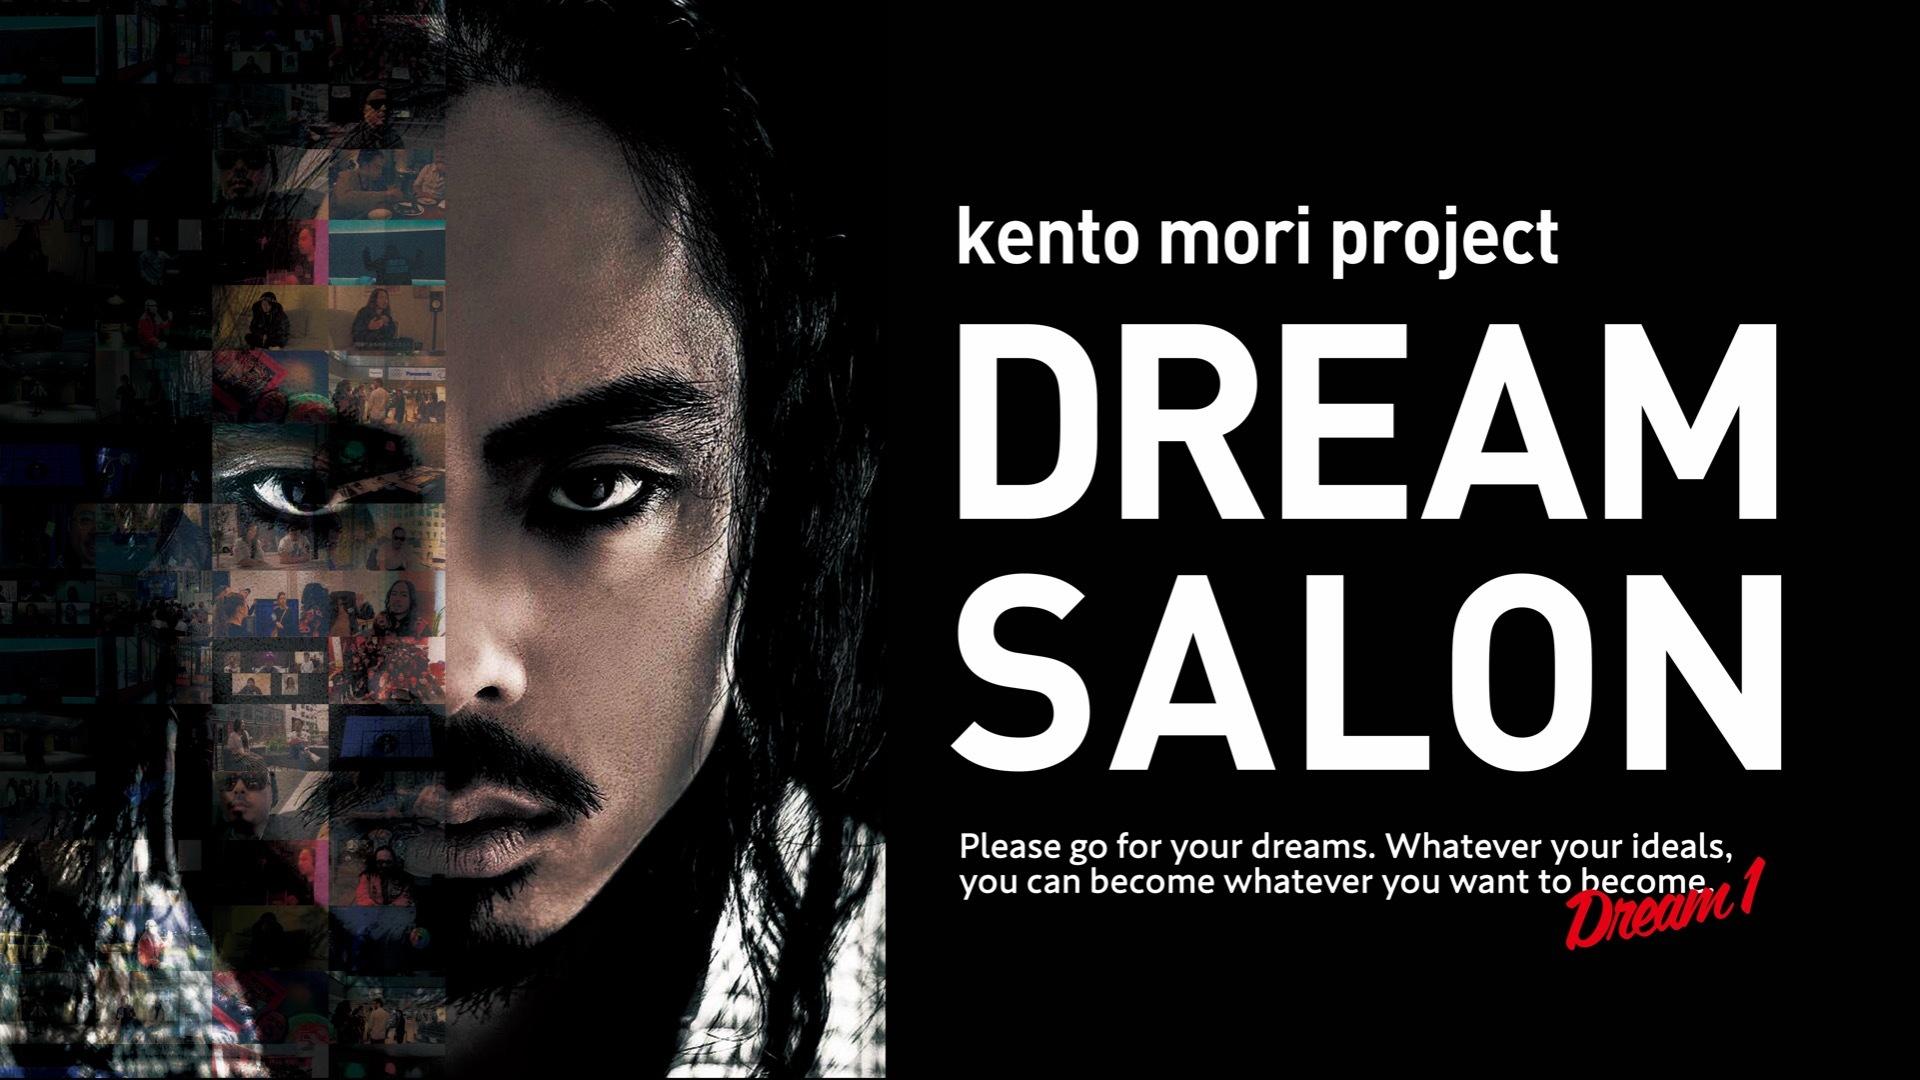 Kento Mori Dream Salon